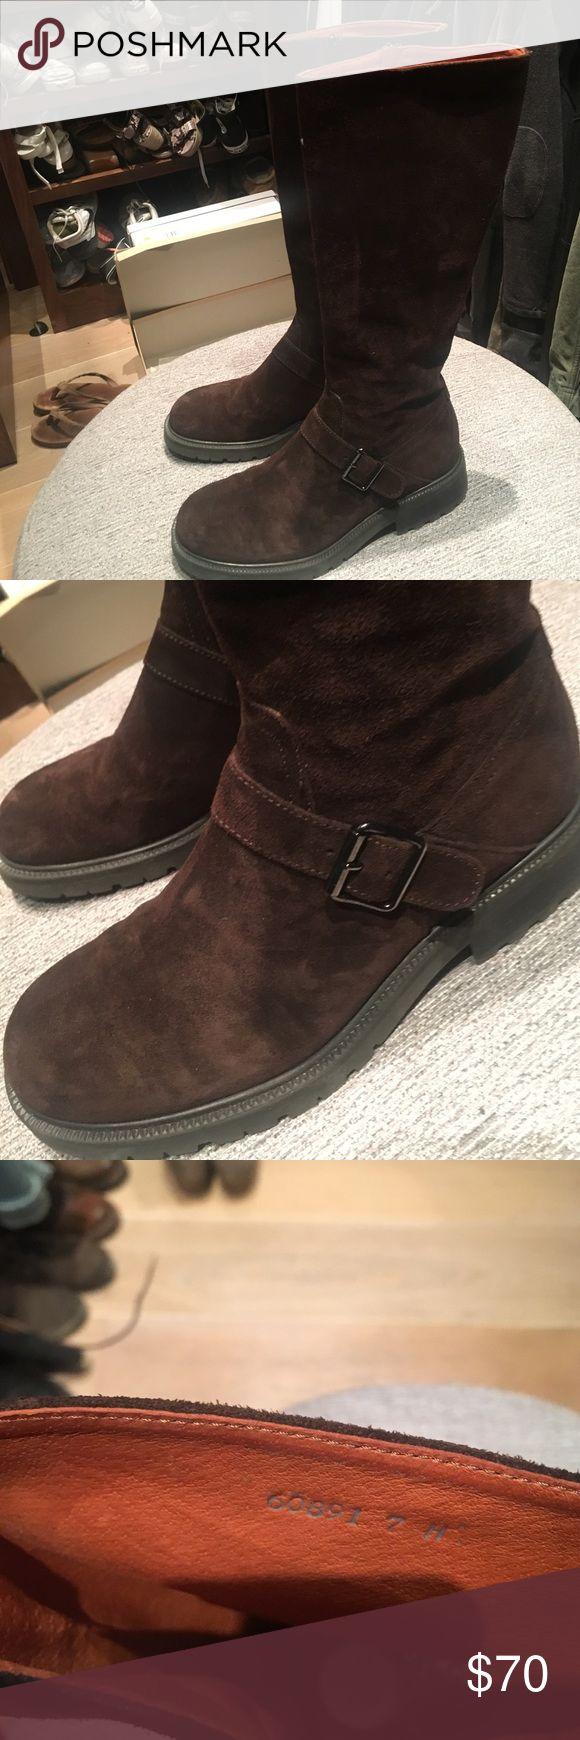 J crew suede boots Worn twice.  Super cool suede boots. Dark brown suede j crew Shoes